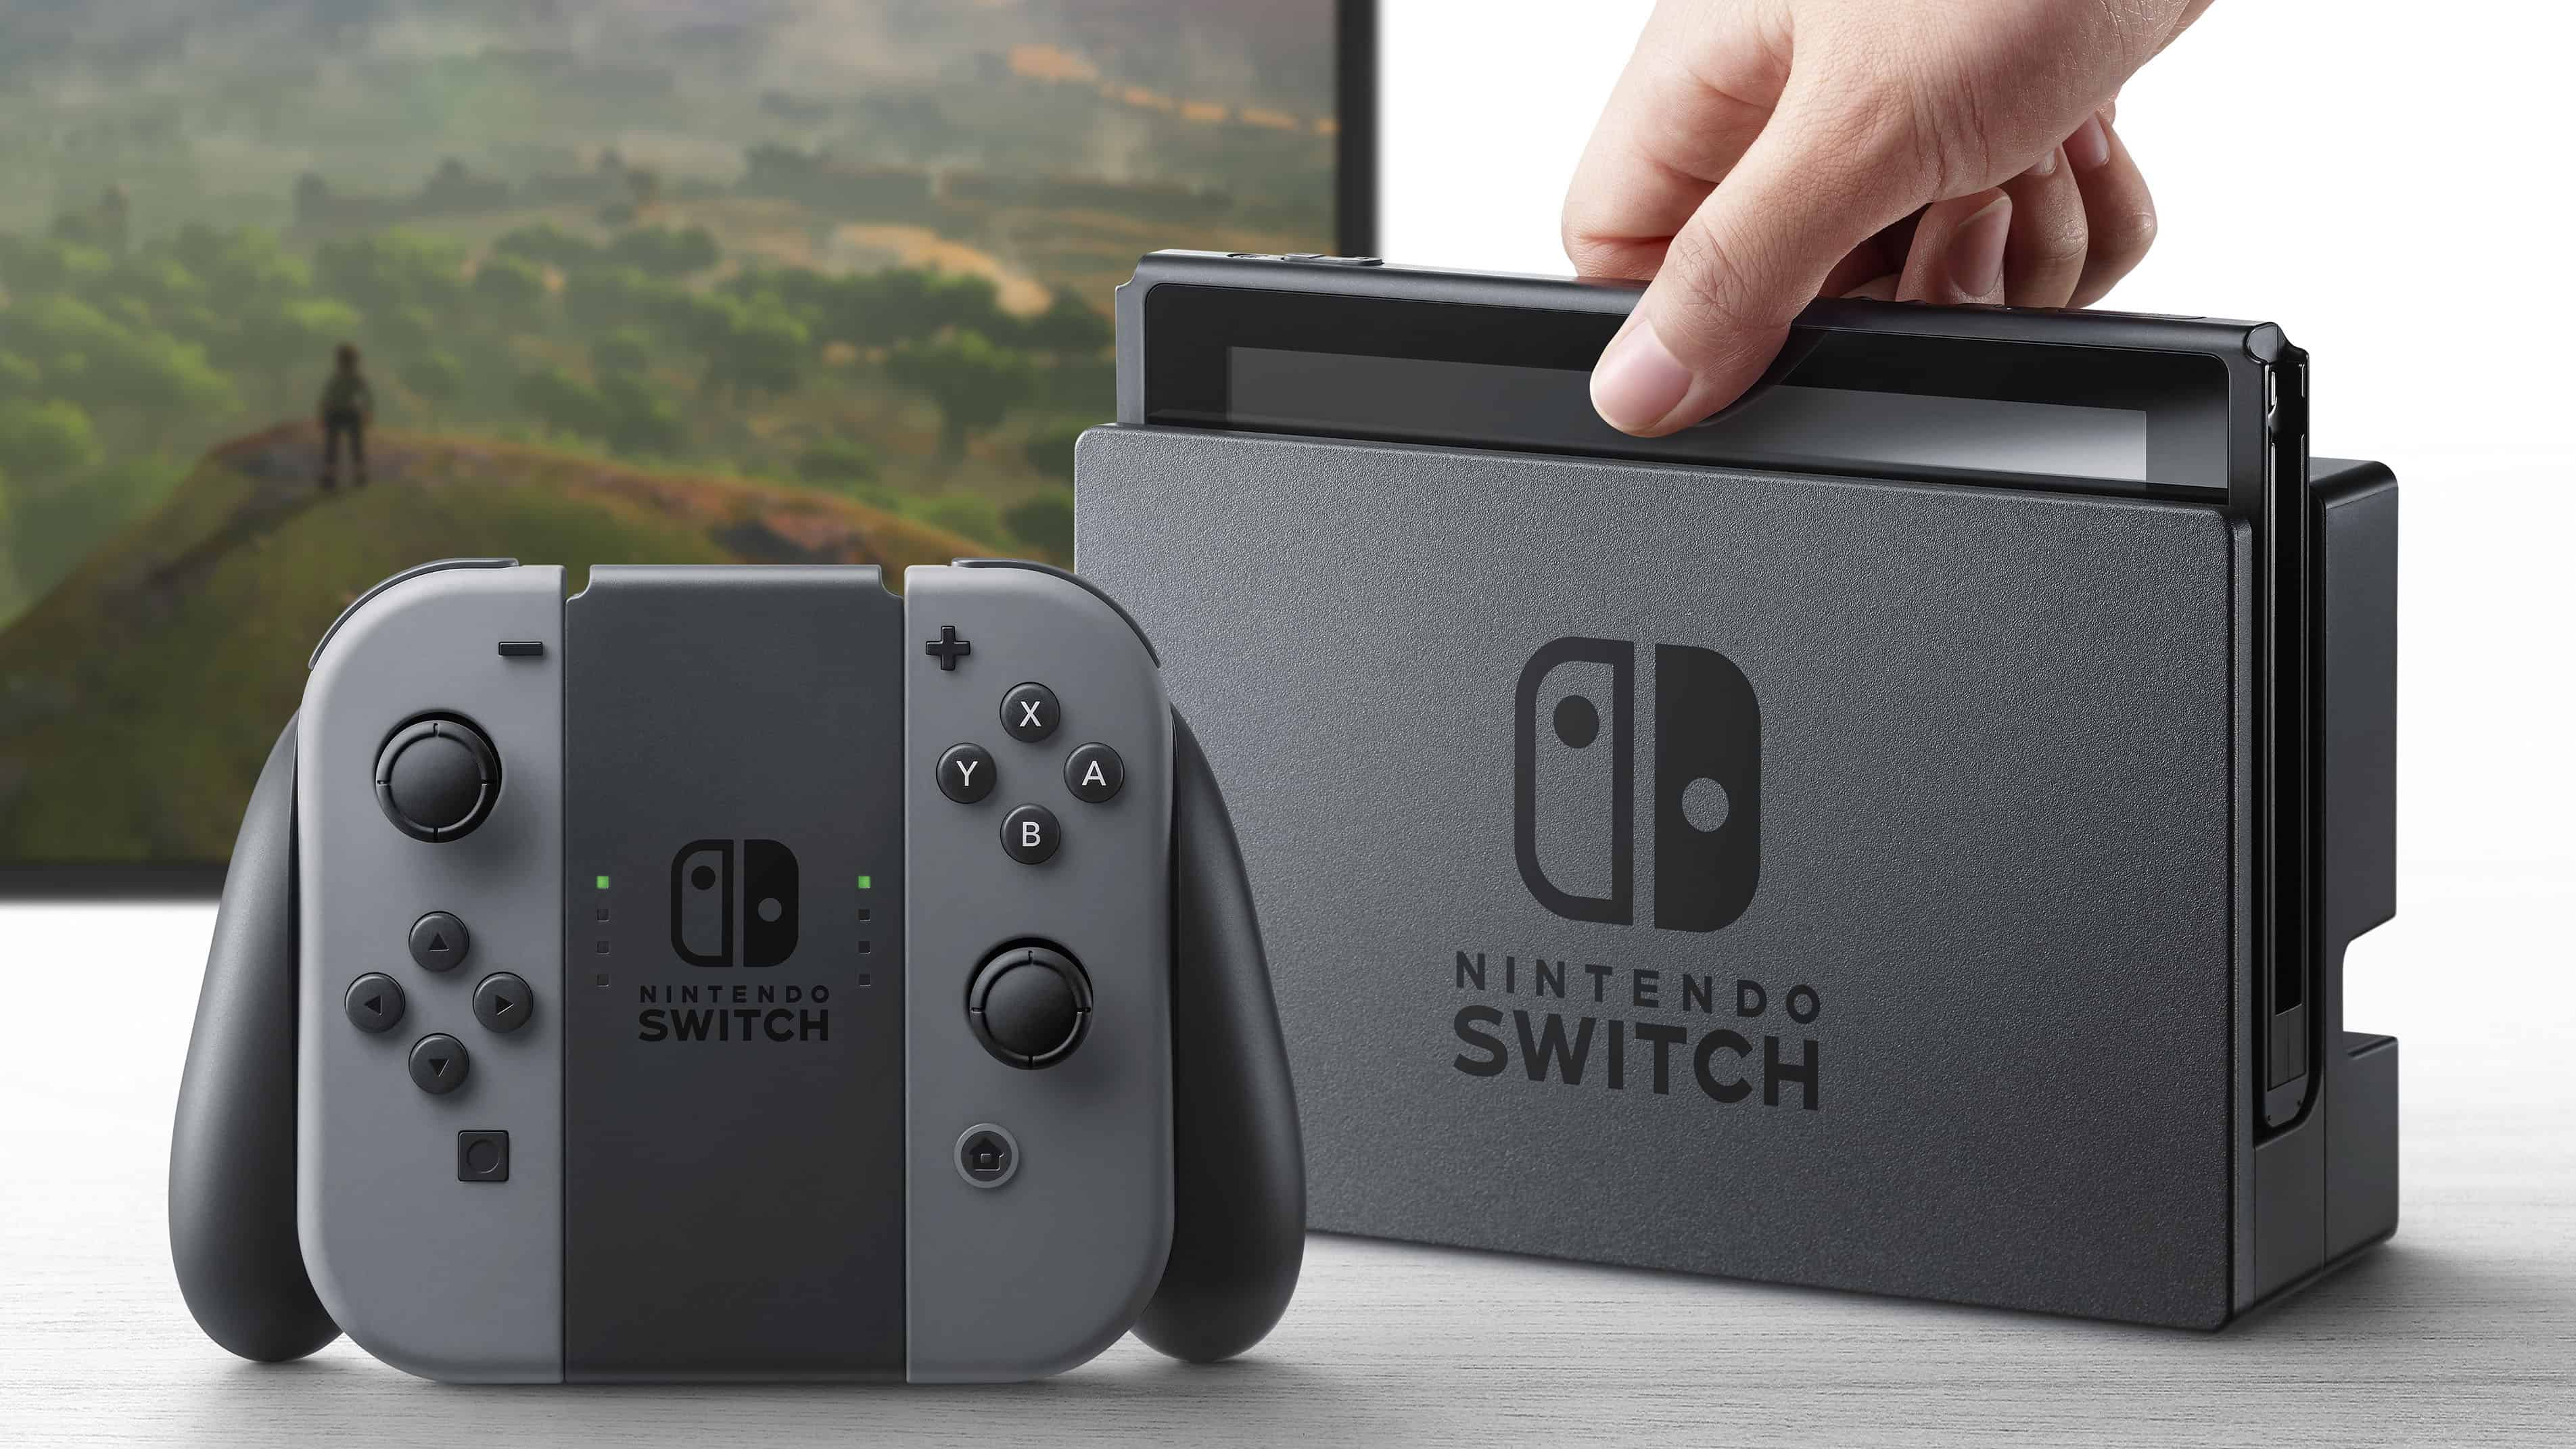 Nintendo Switch Tonight Show